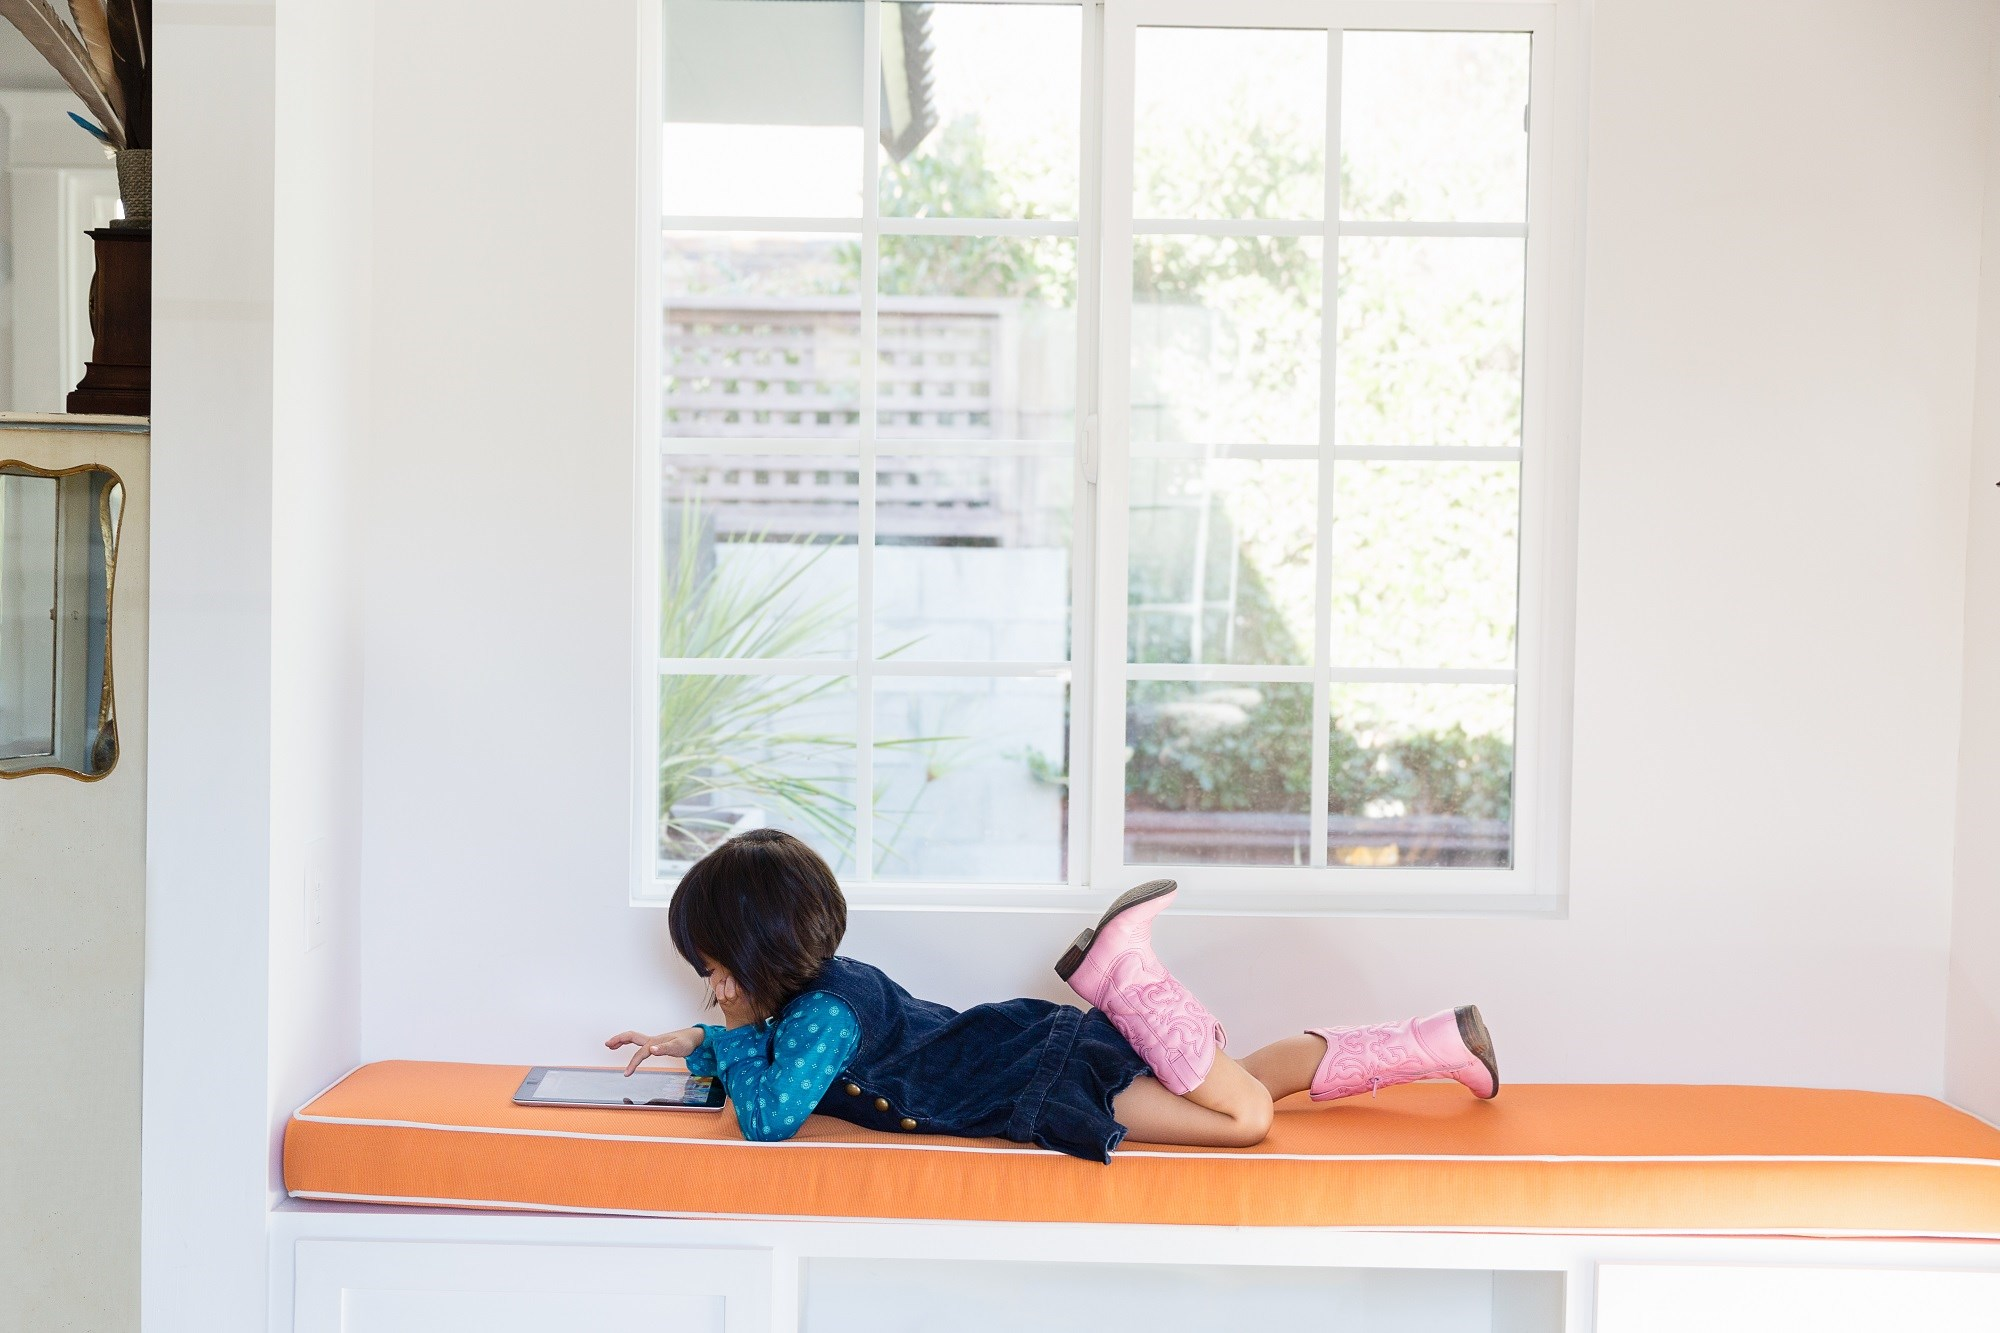 Preschooler's Perfectionism May Predict OCD in Adolescence